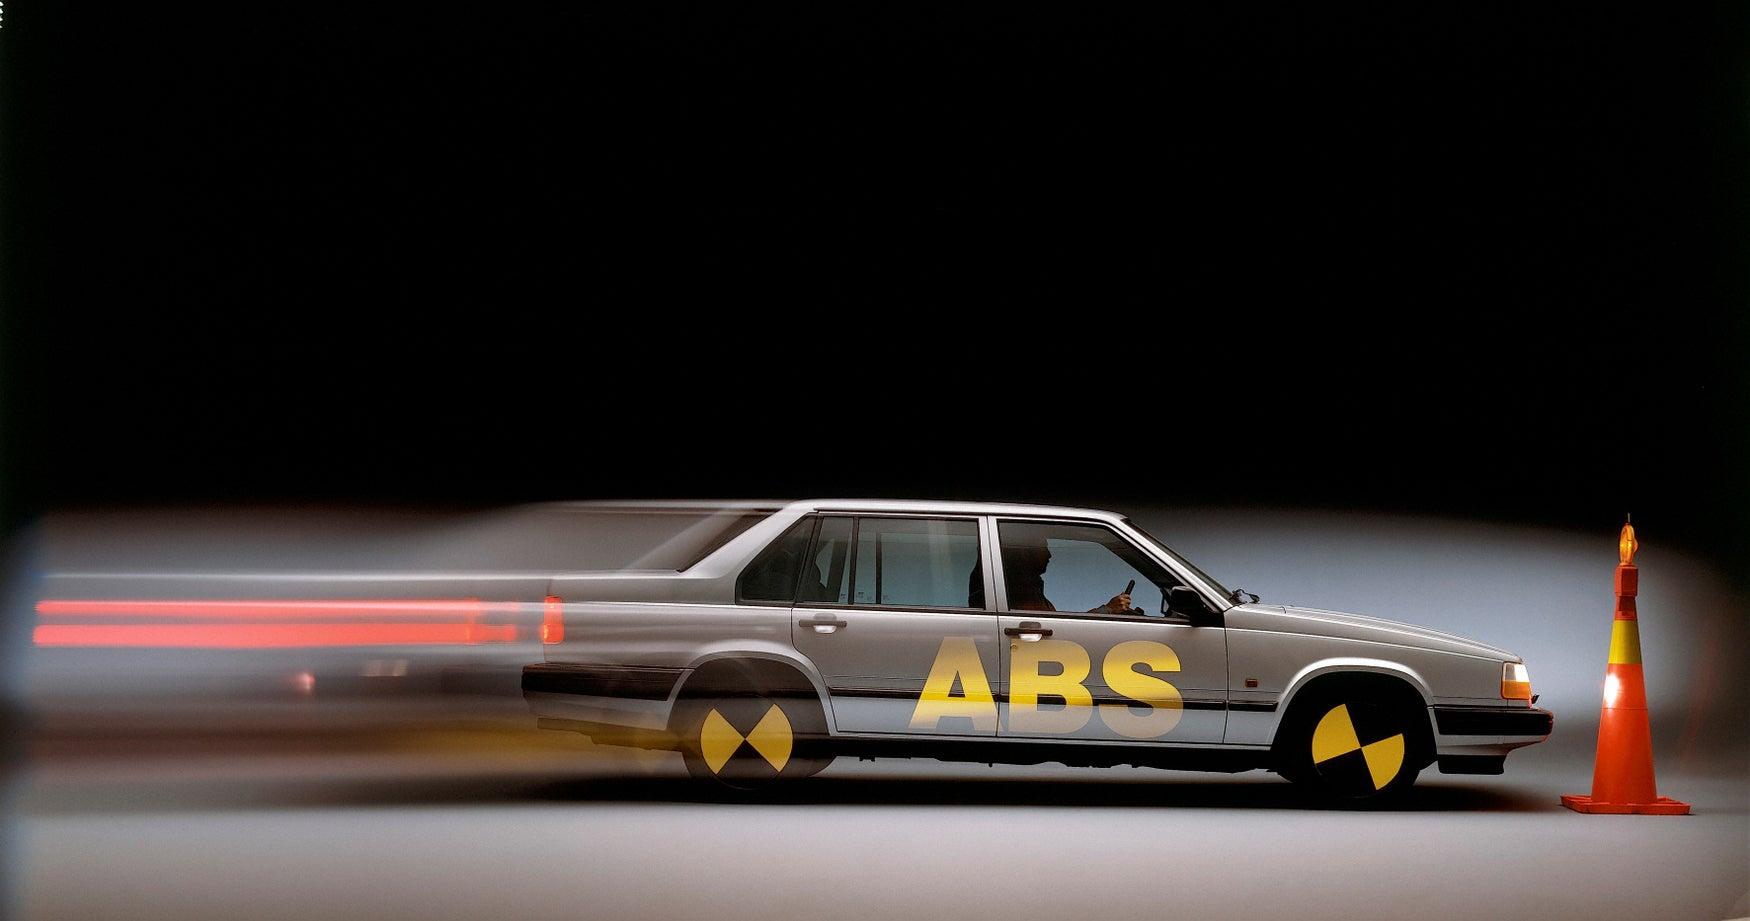 Volvo ABS test